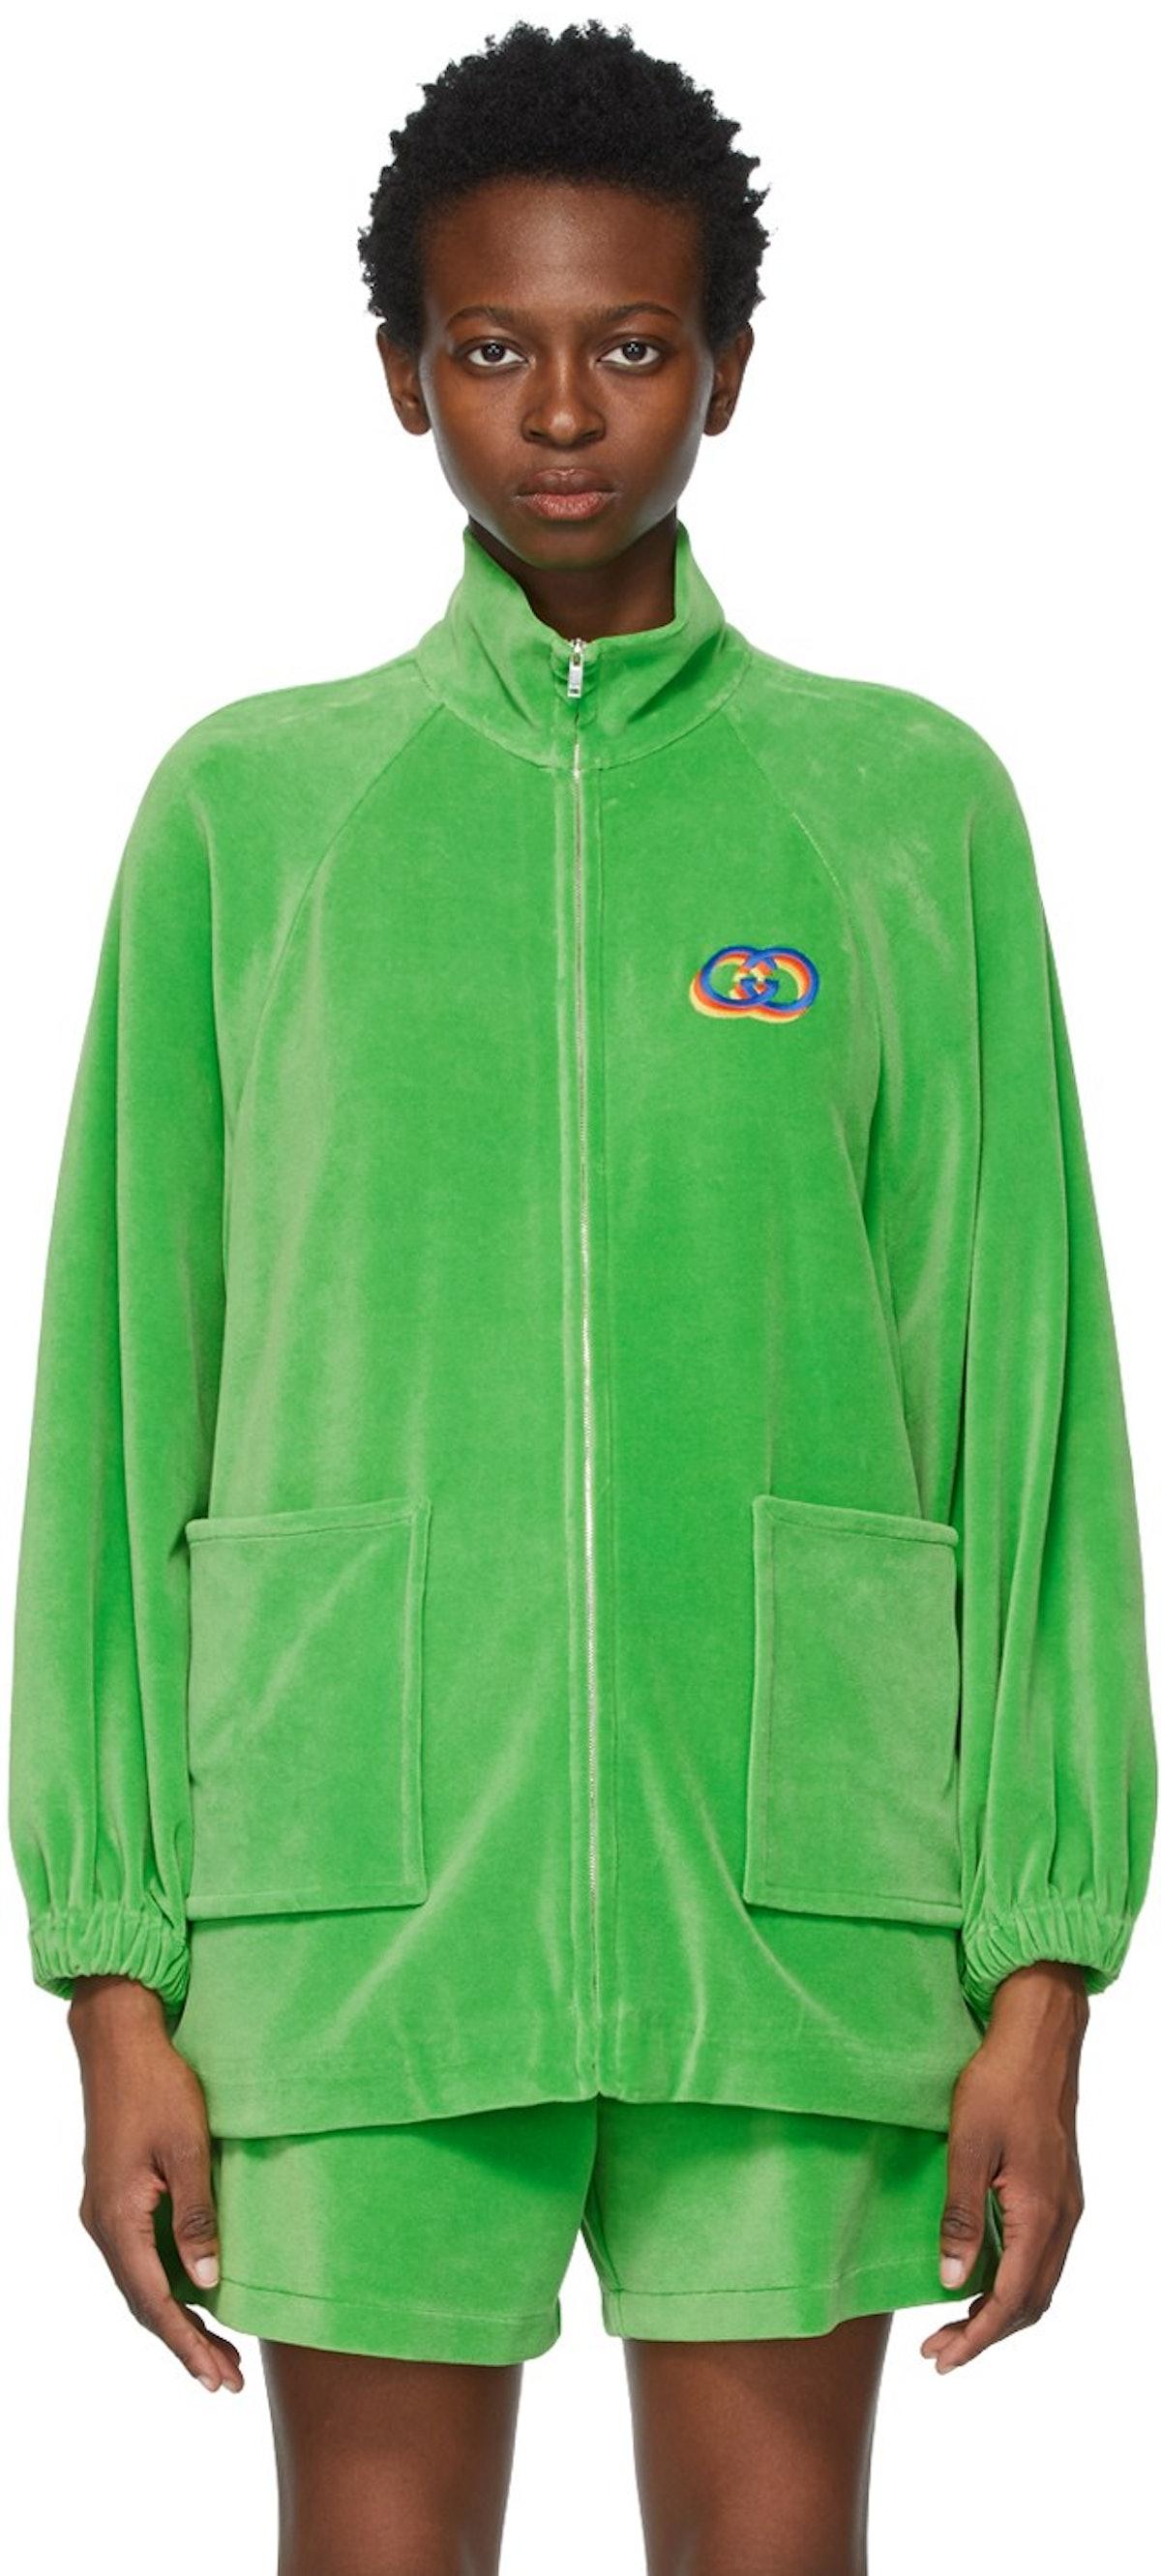 Green Velour Zip-Up Sweater